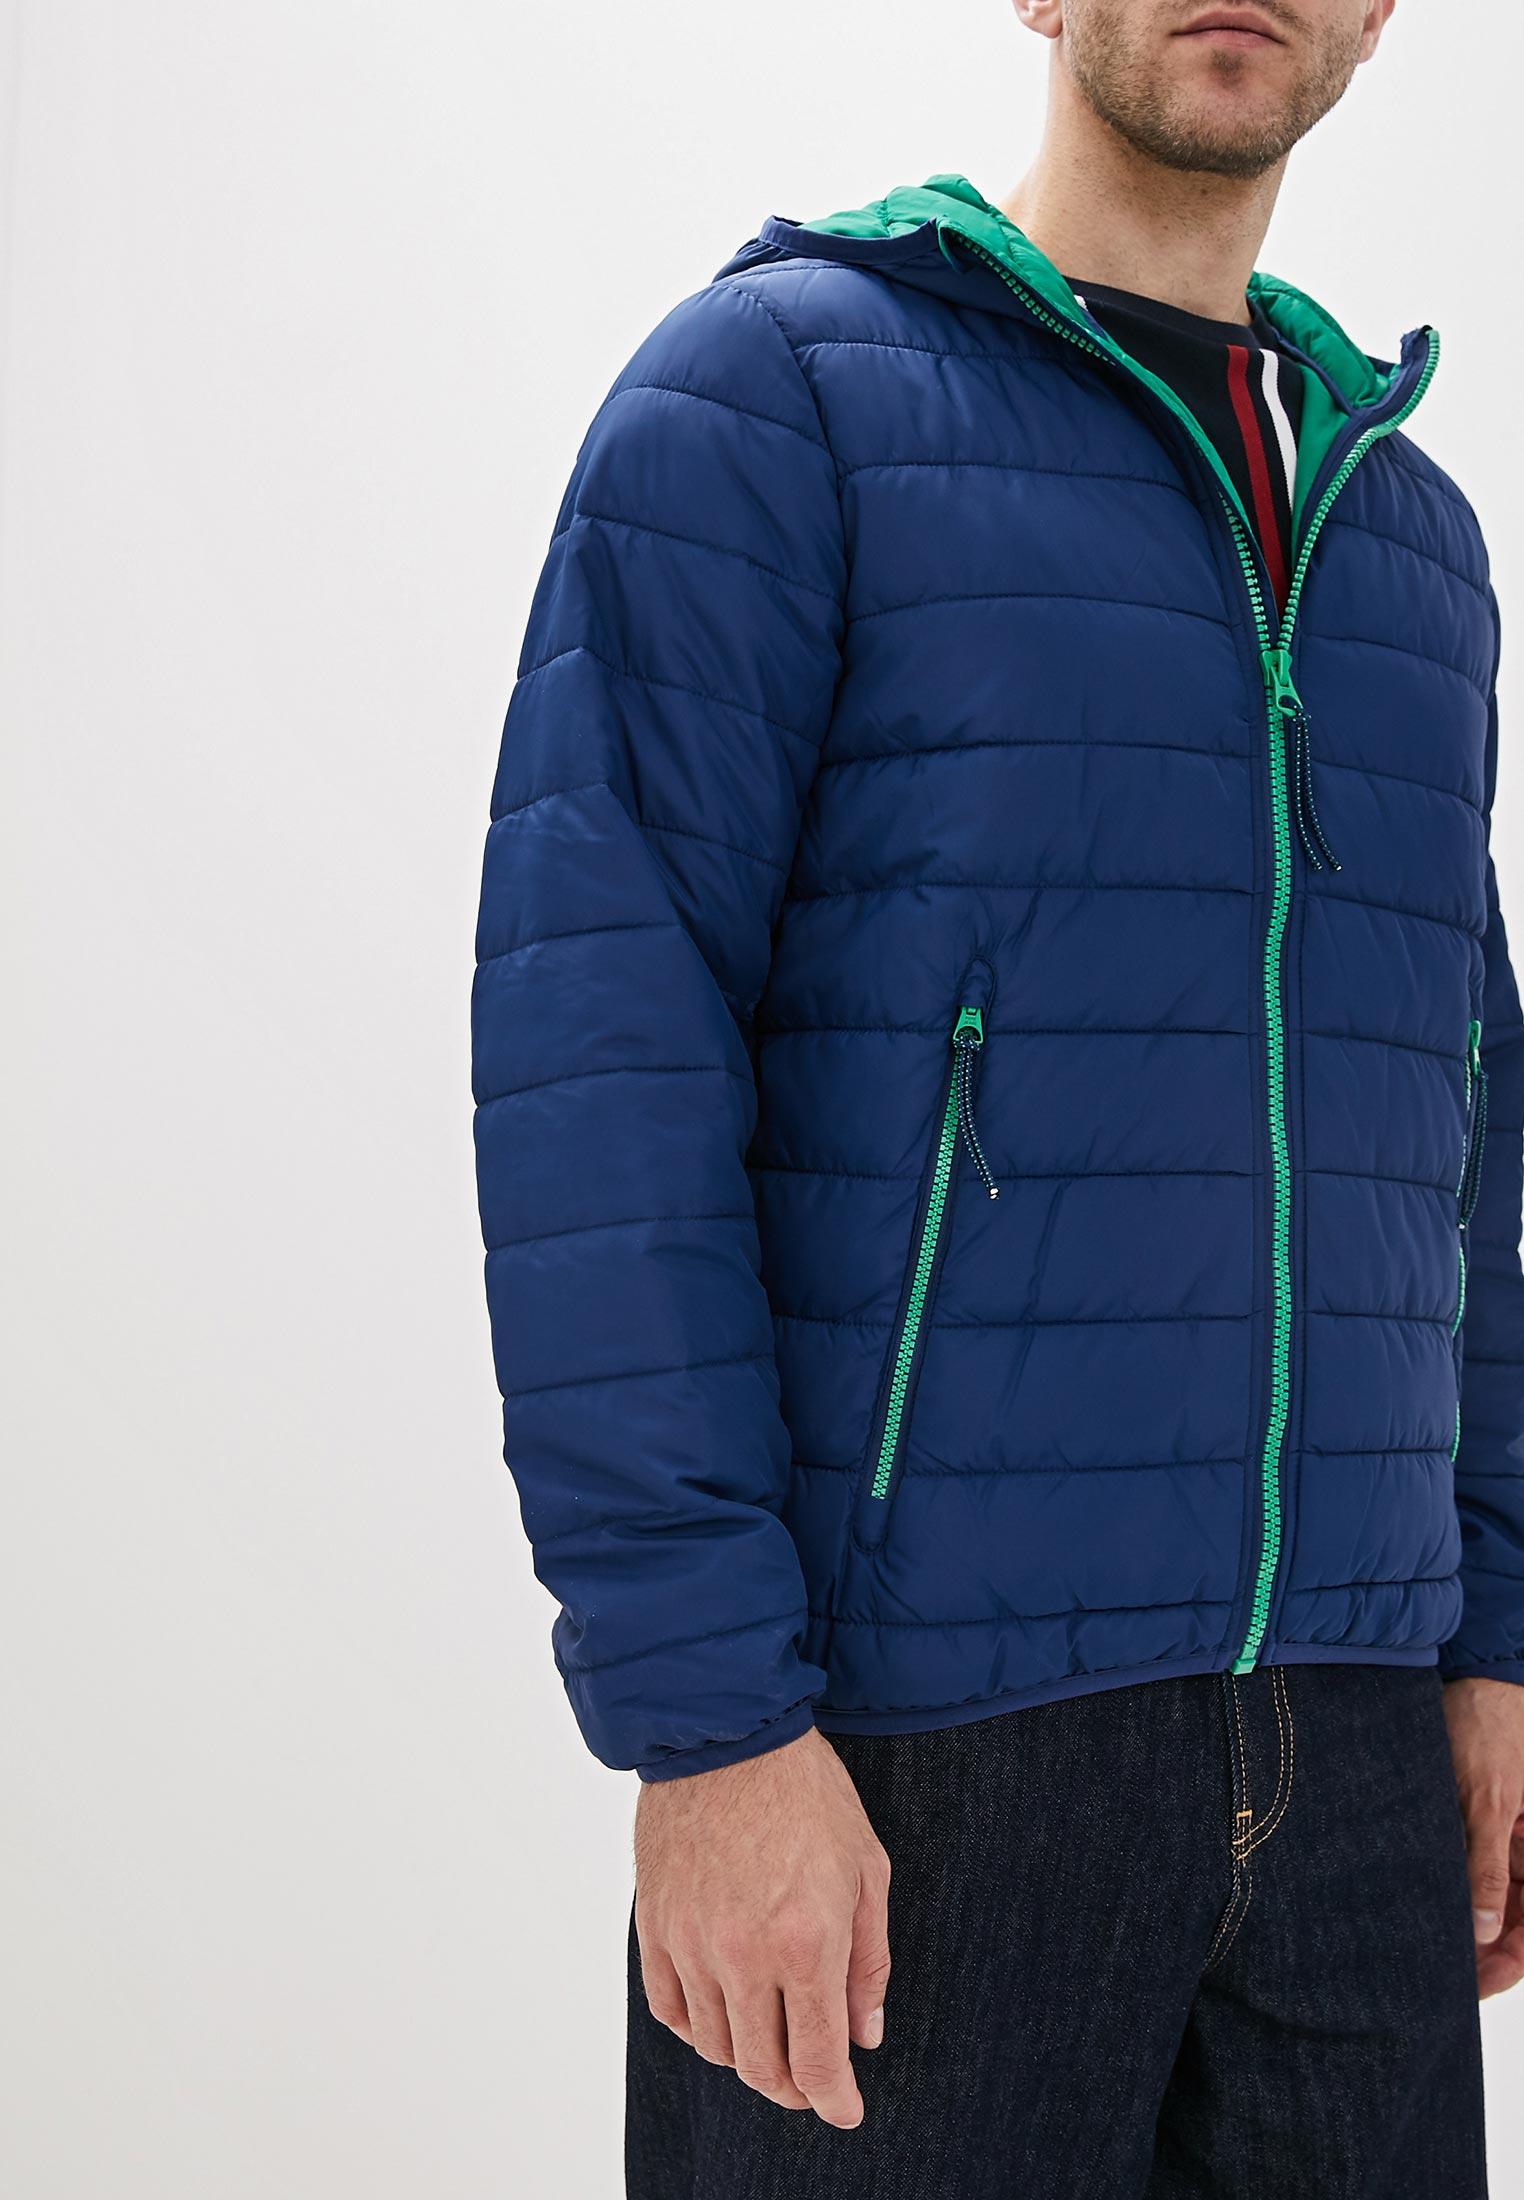 Утепленная куртка Pepe Jeans (Пепе Джинс) PM402096